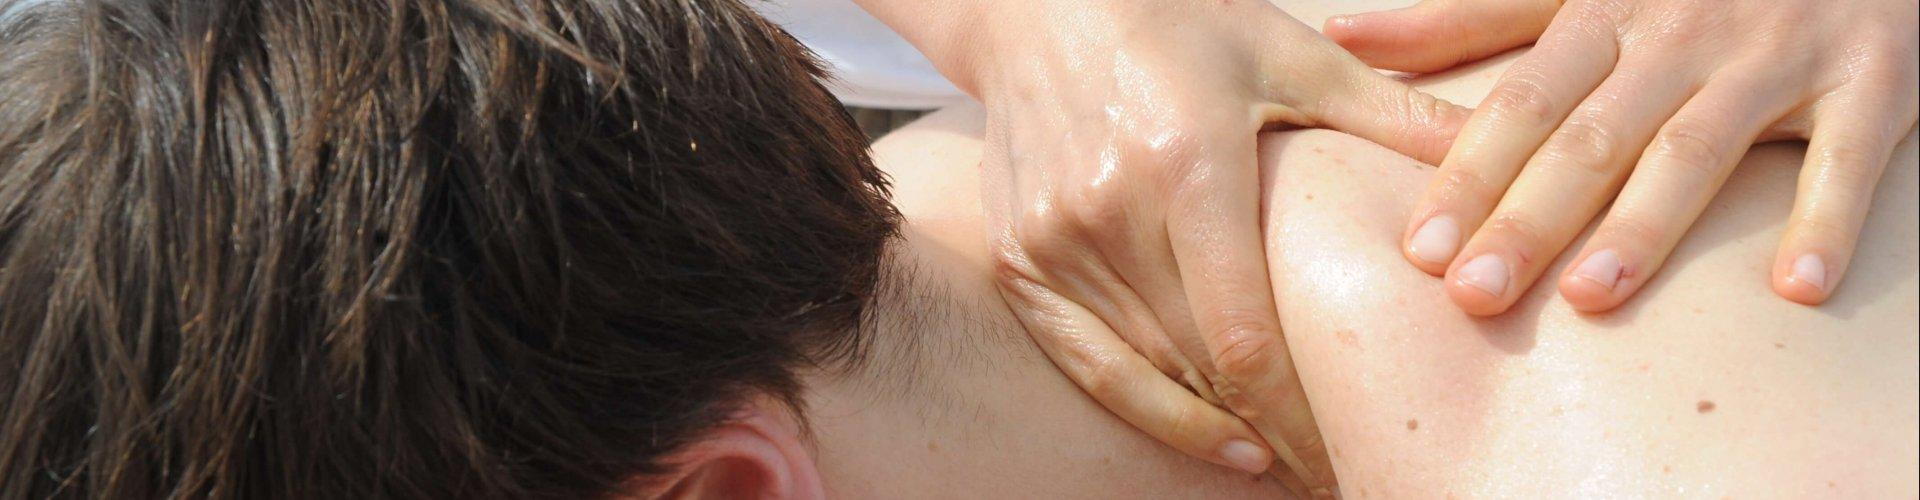 sport-massage-nijmegen-den-haag